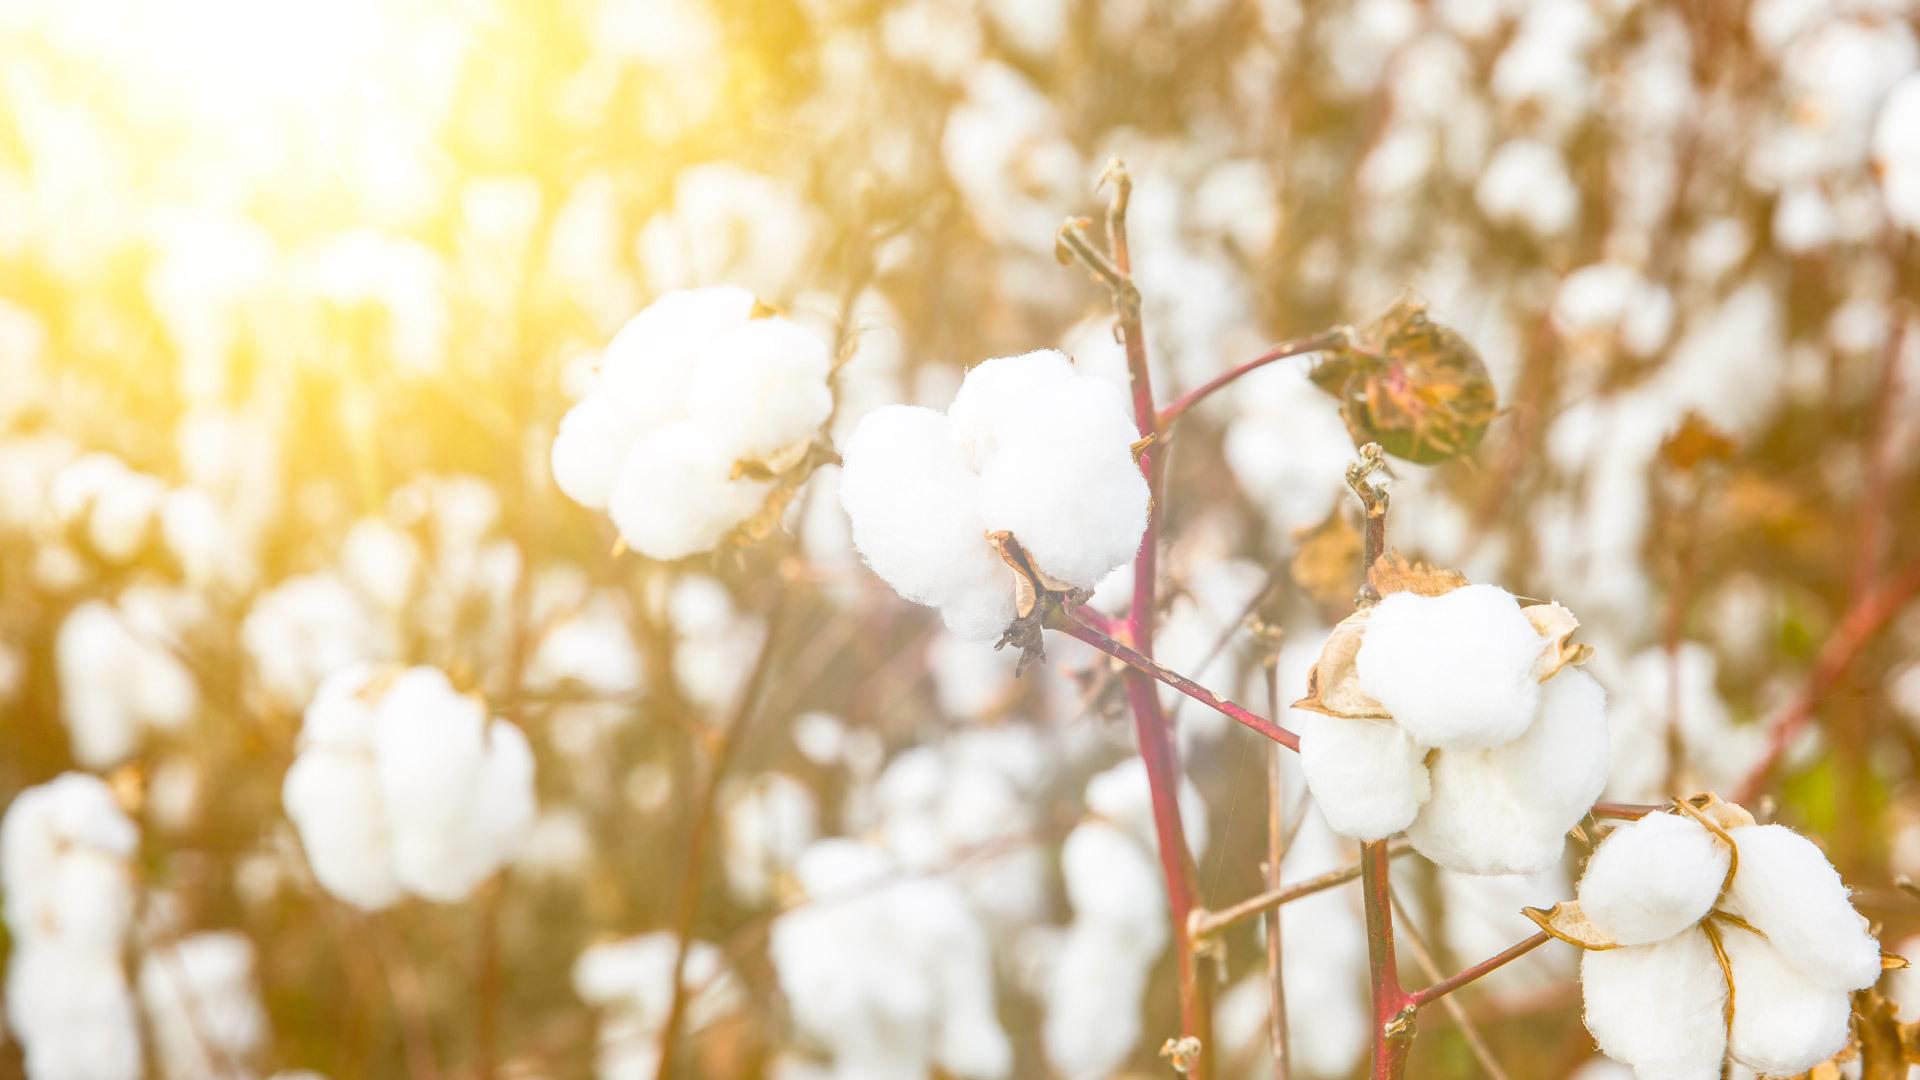 b.肌肤敏感夏季又容易长痘痘,那么100%纯棉材质就是不二之选